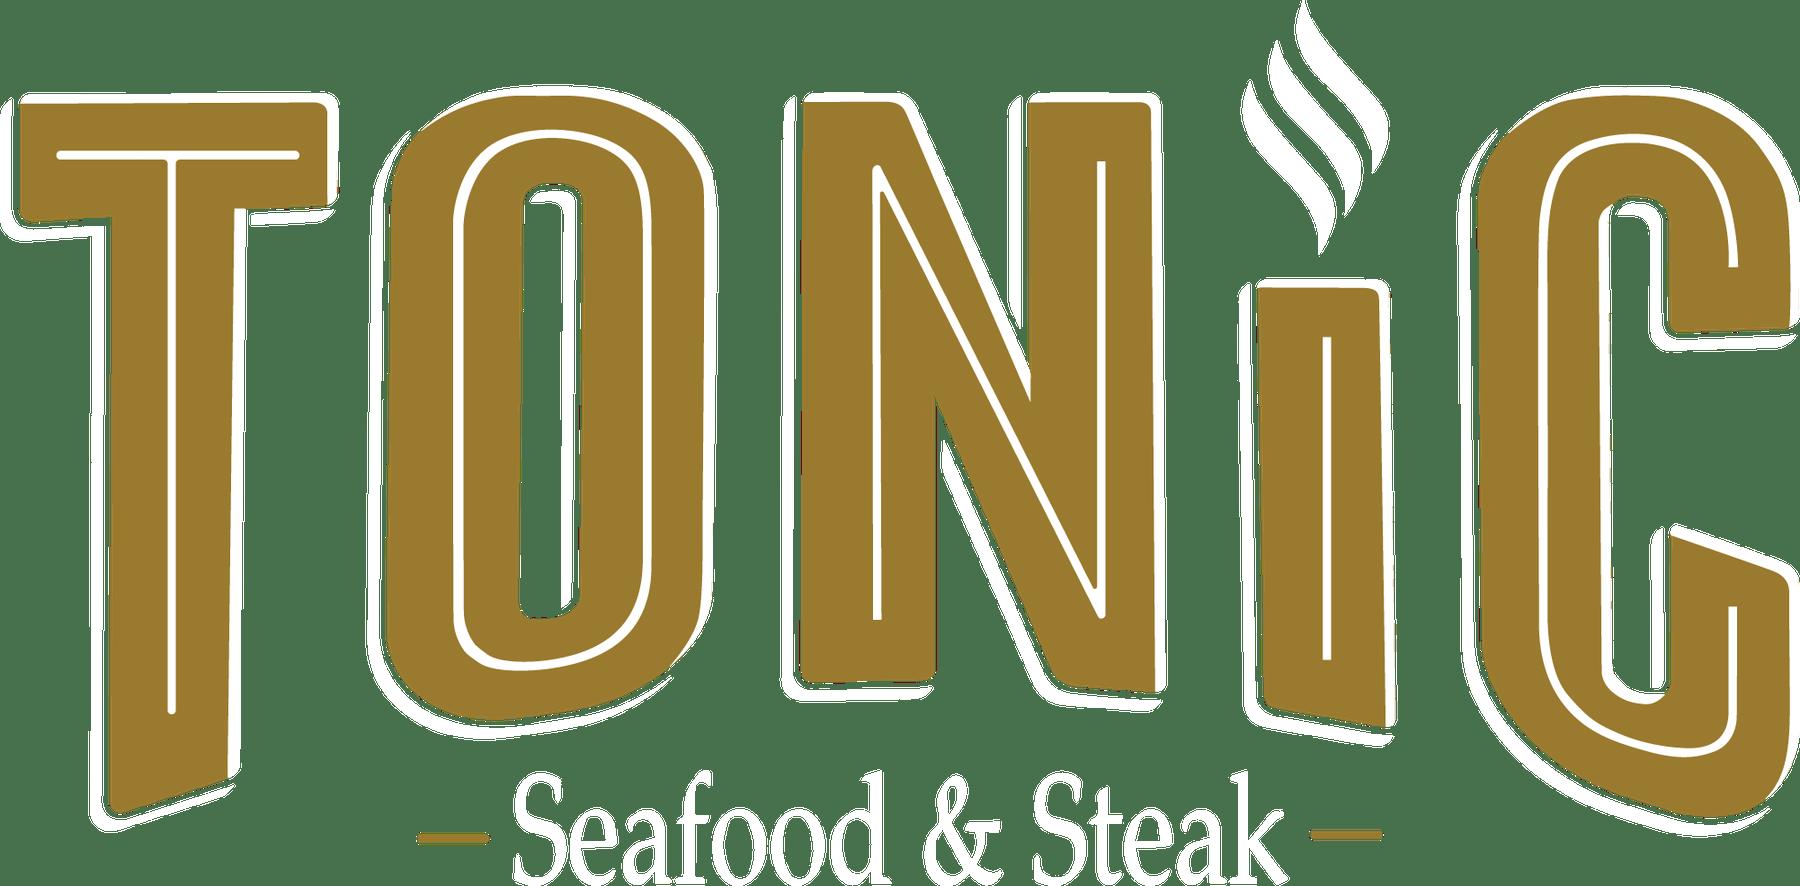 Tonic Seafood & Steak Home